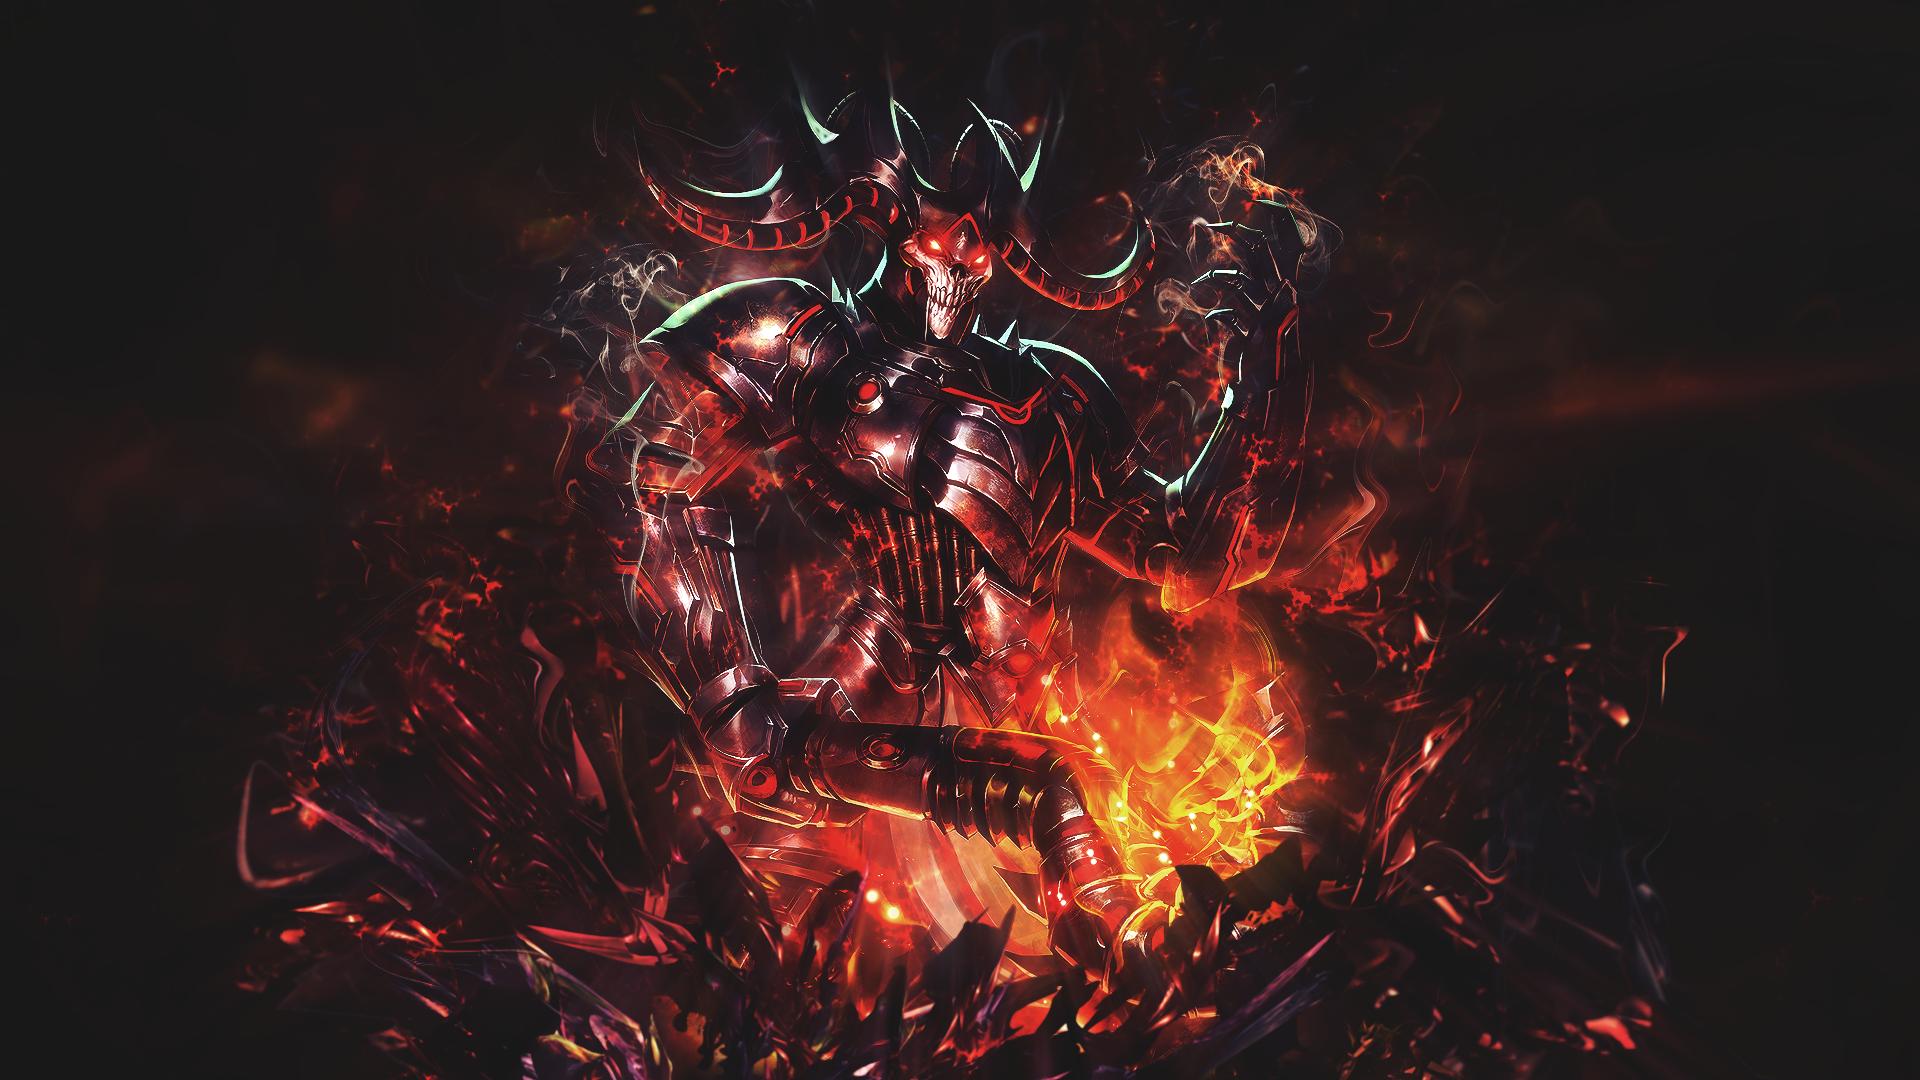 Hades Grim Wraith Smite HD Wallpaper Background Image 1920x1080